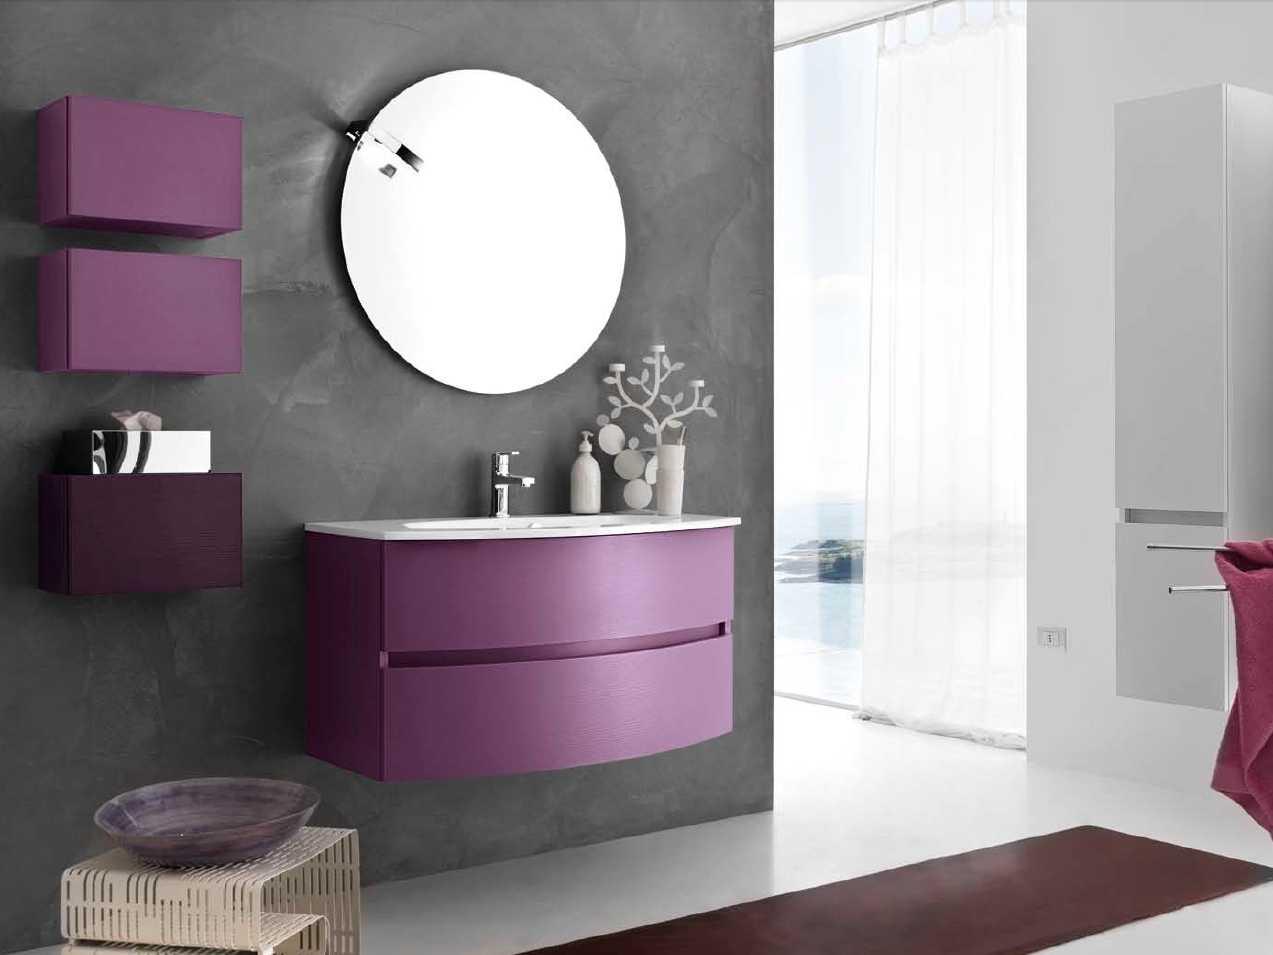 Mobili Da Bagno Scavolini : Mobili da bagno scavolini with mobili da bagno scavolini